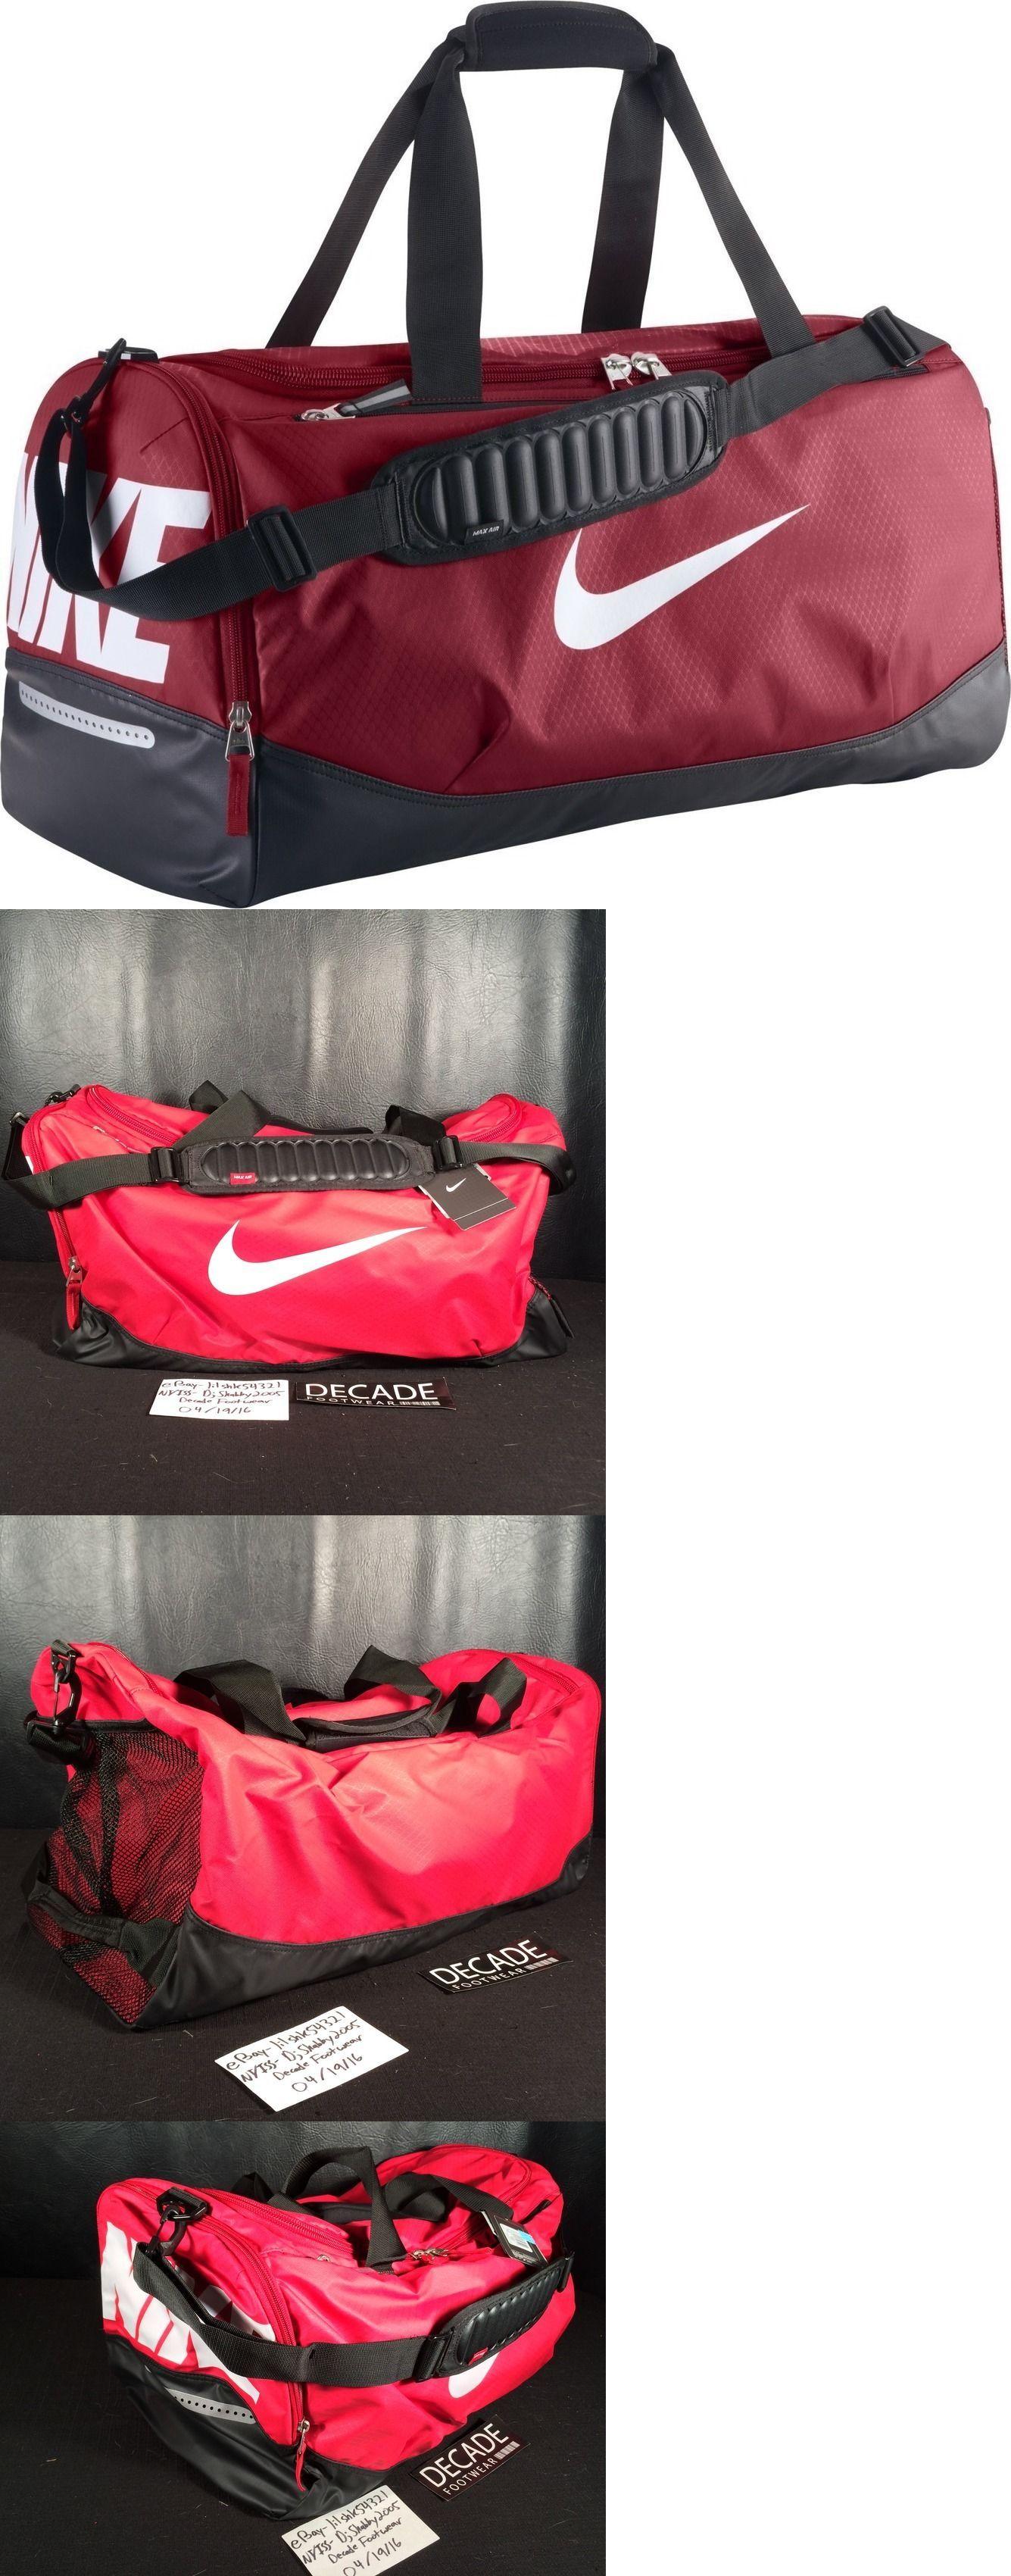 Bags and Backpacks 163537: Nike Air Max Duffel Gym Training Black Red Medium Bag Travel School Ba4895 601 -> BUY IT NOW ONLY: $34.99 on eBay!